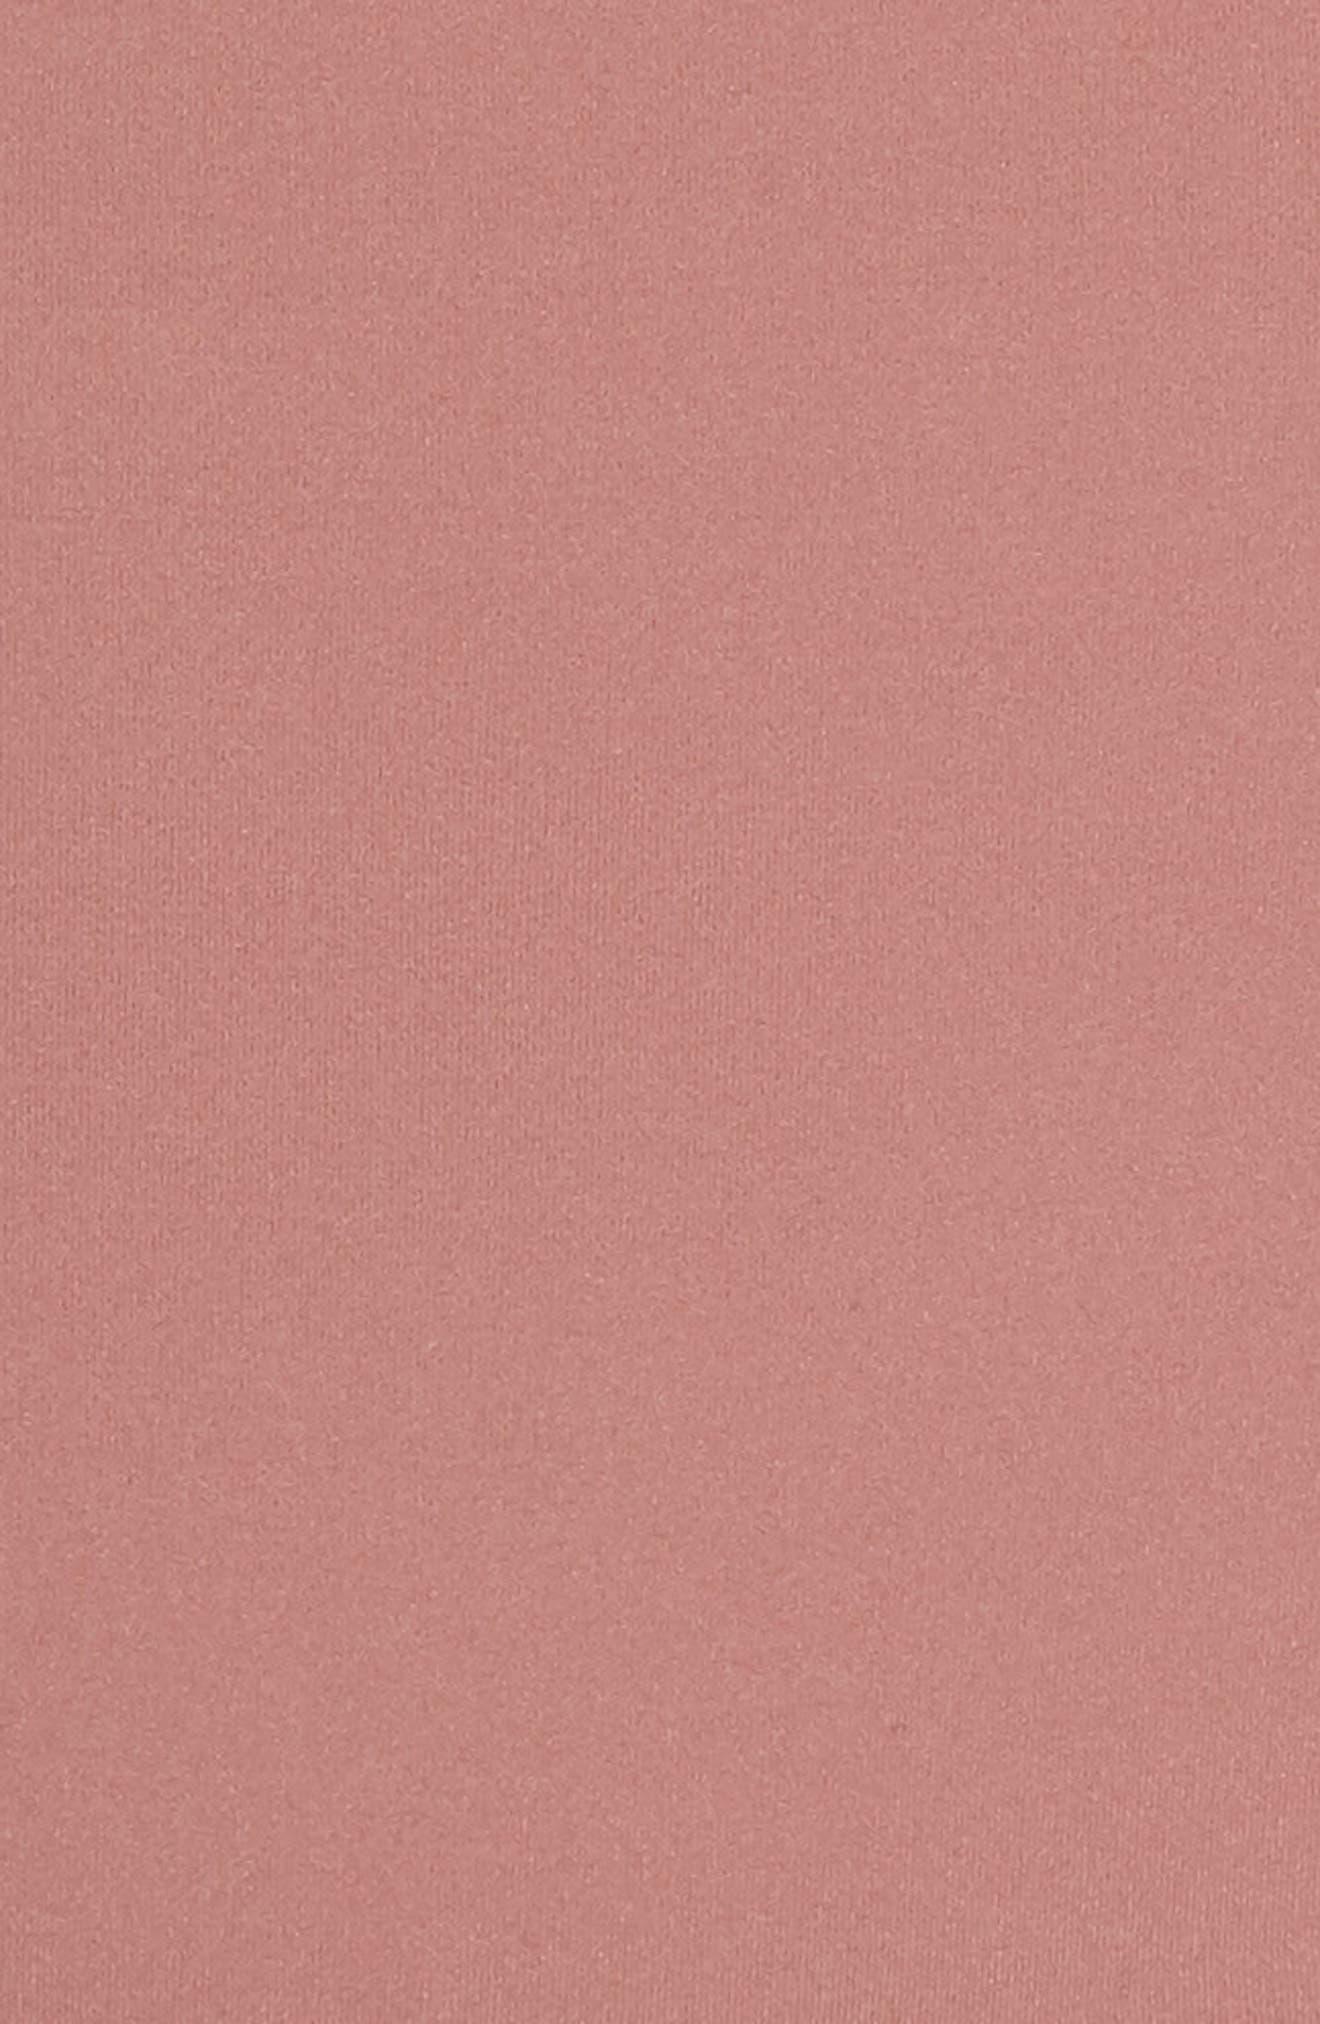 Undie-tectable Briefs,                             Alternate thumbnail 5, color,                             Desert Rose